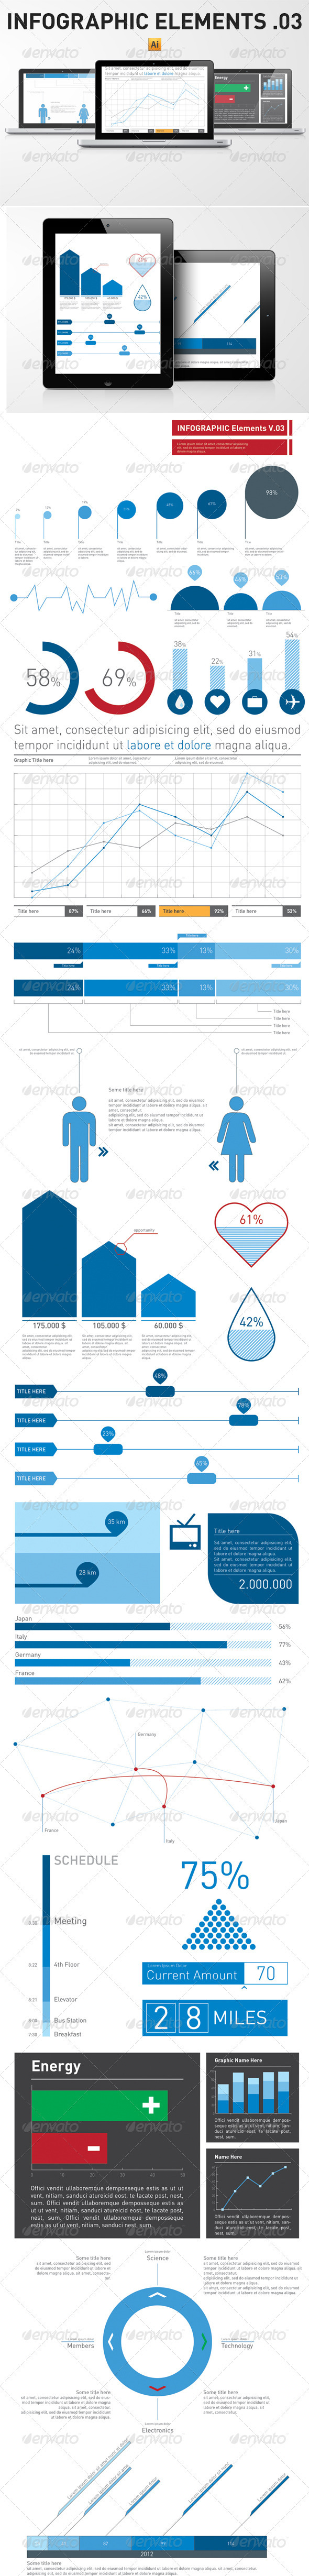 Infographic template website 754577 - chesslinks.info